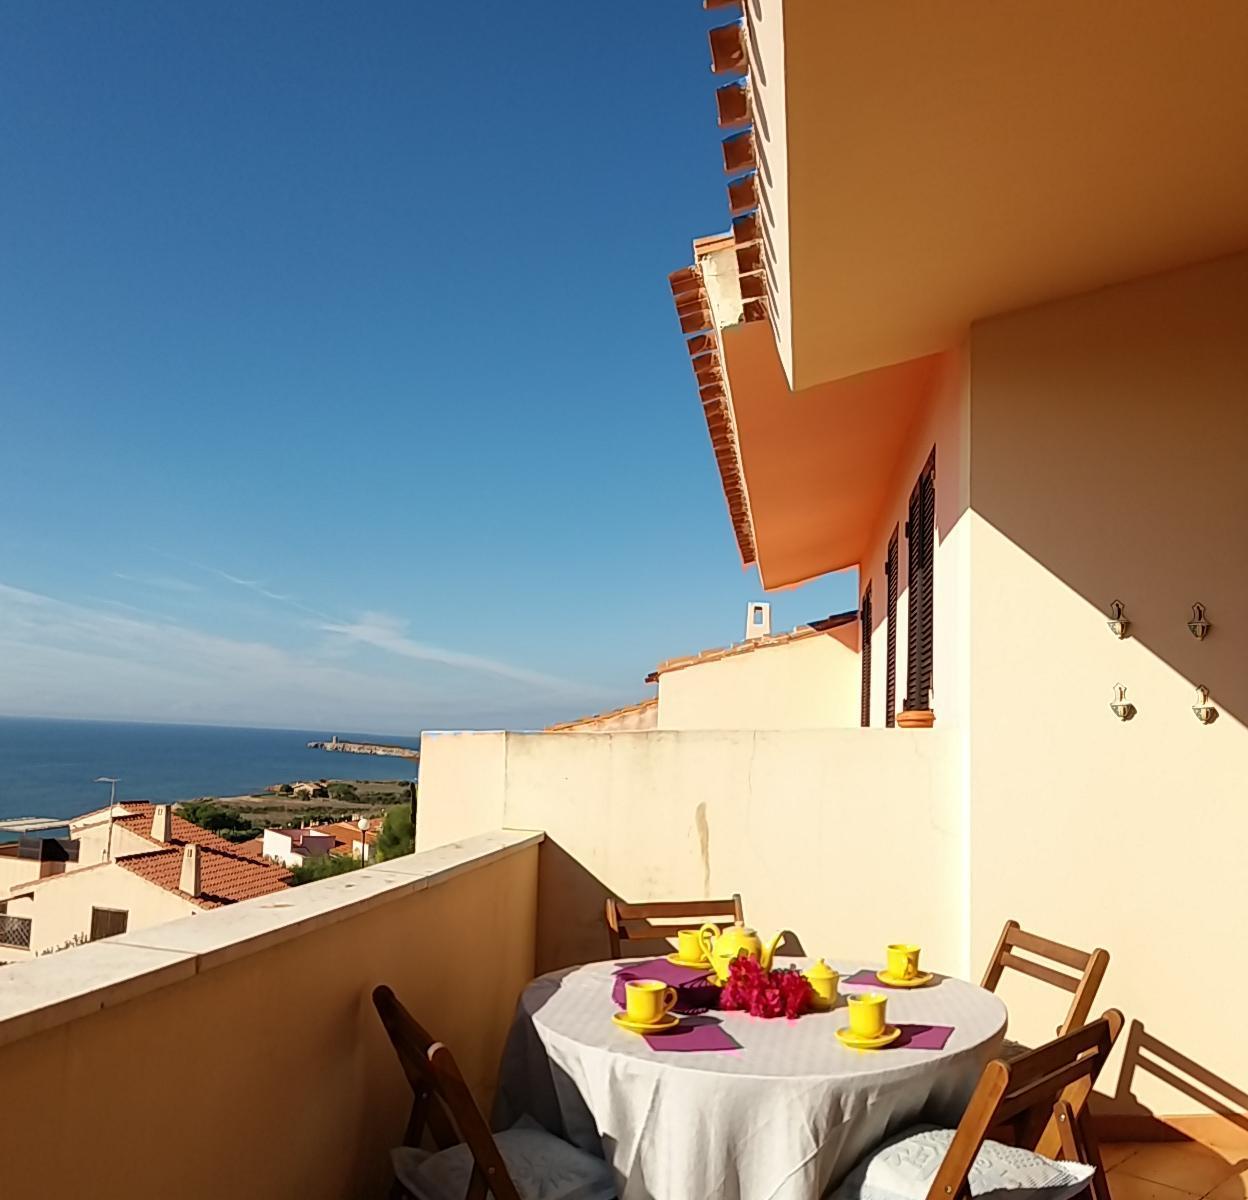 Ferienhaus in Funtana Meiga, 100 Meter vom Meer entfernt (498100), Oristano, Oristano, Sardinien, Italien, Bild 19